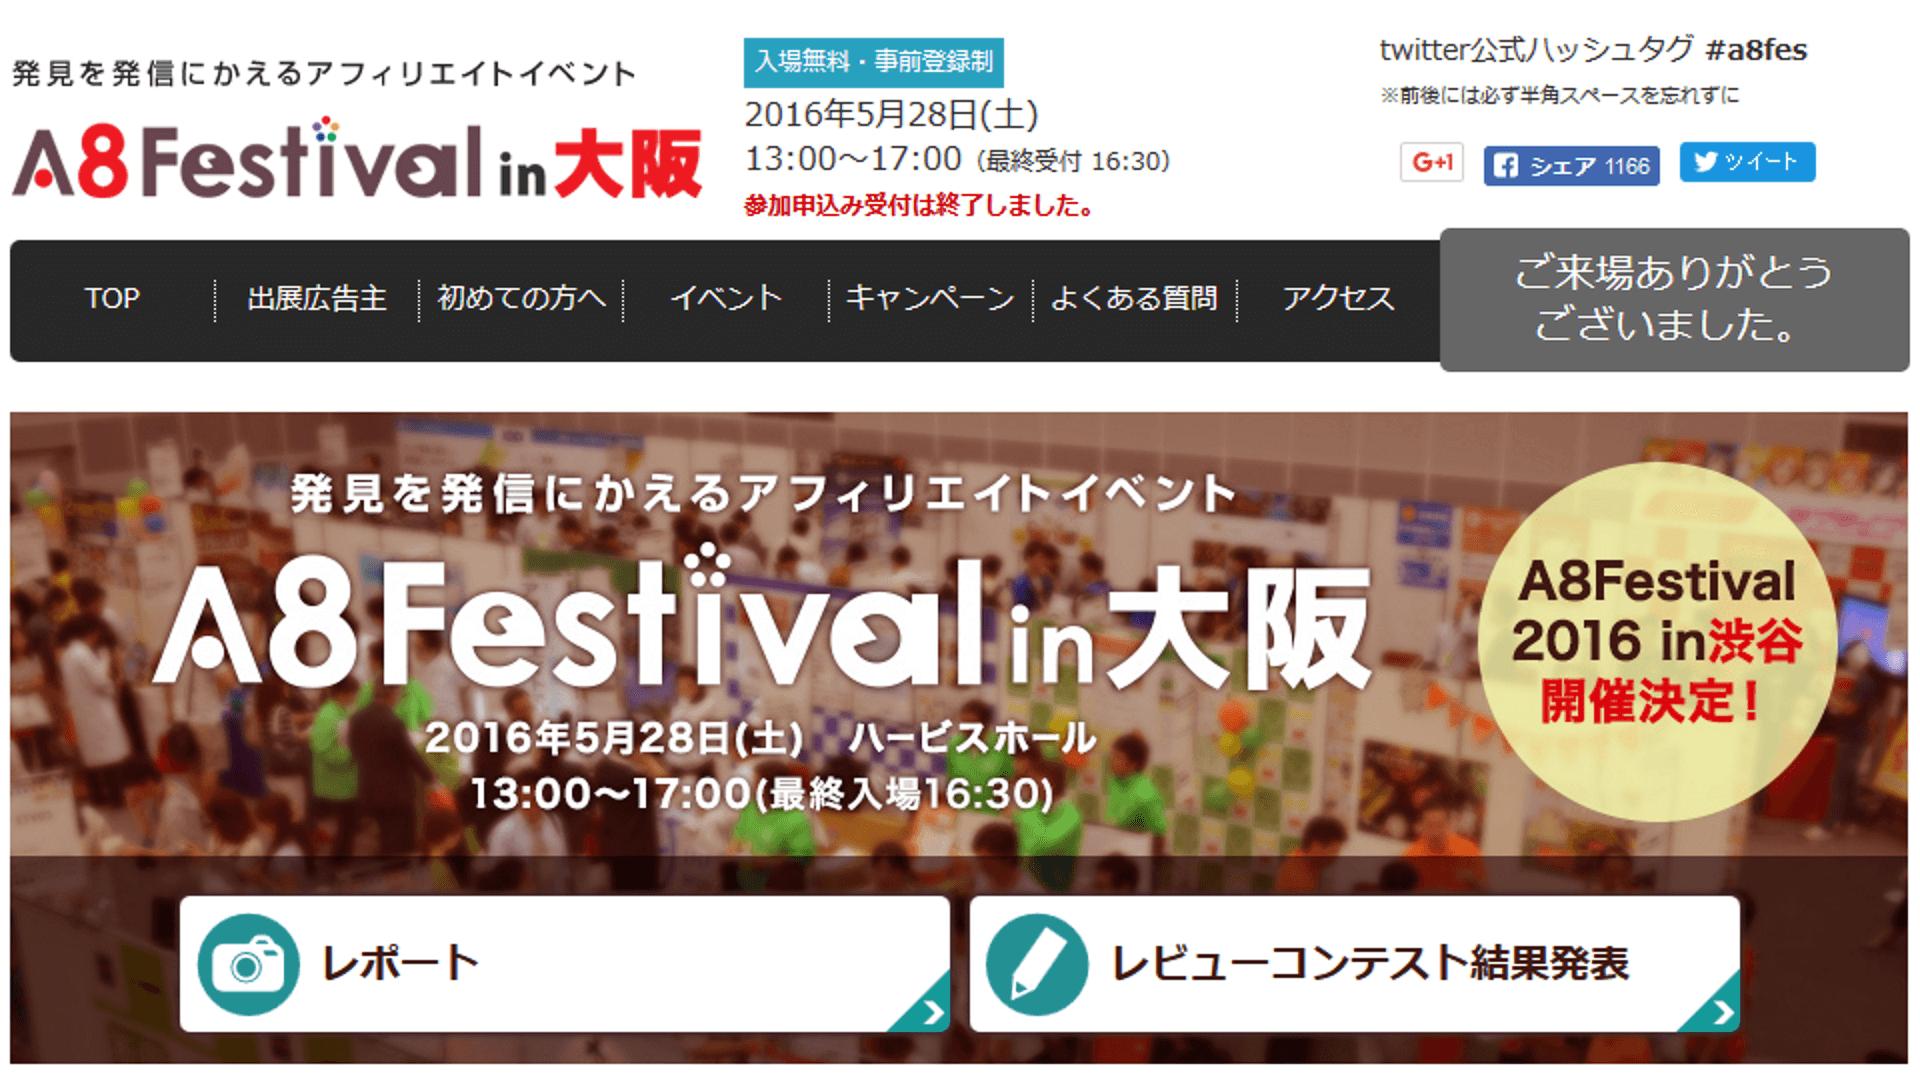 A8 フェスティバル 2016 in 大阪のWebページ